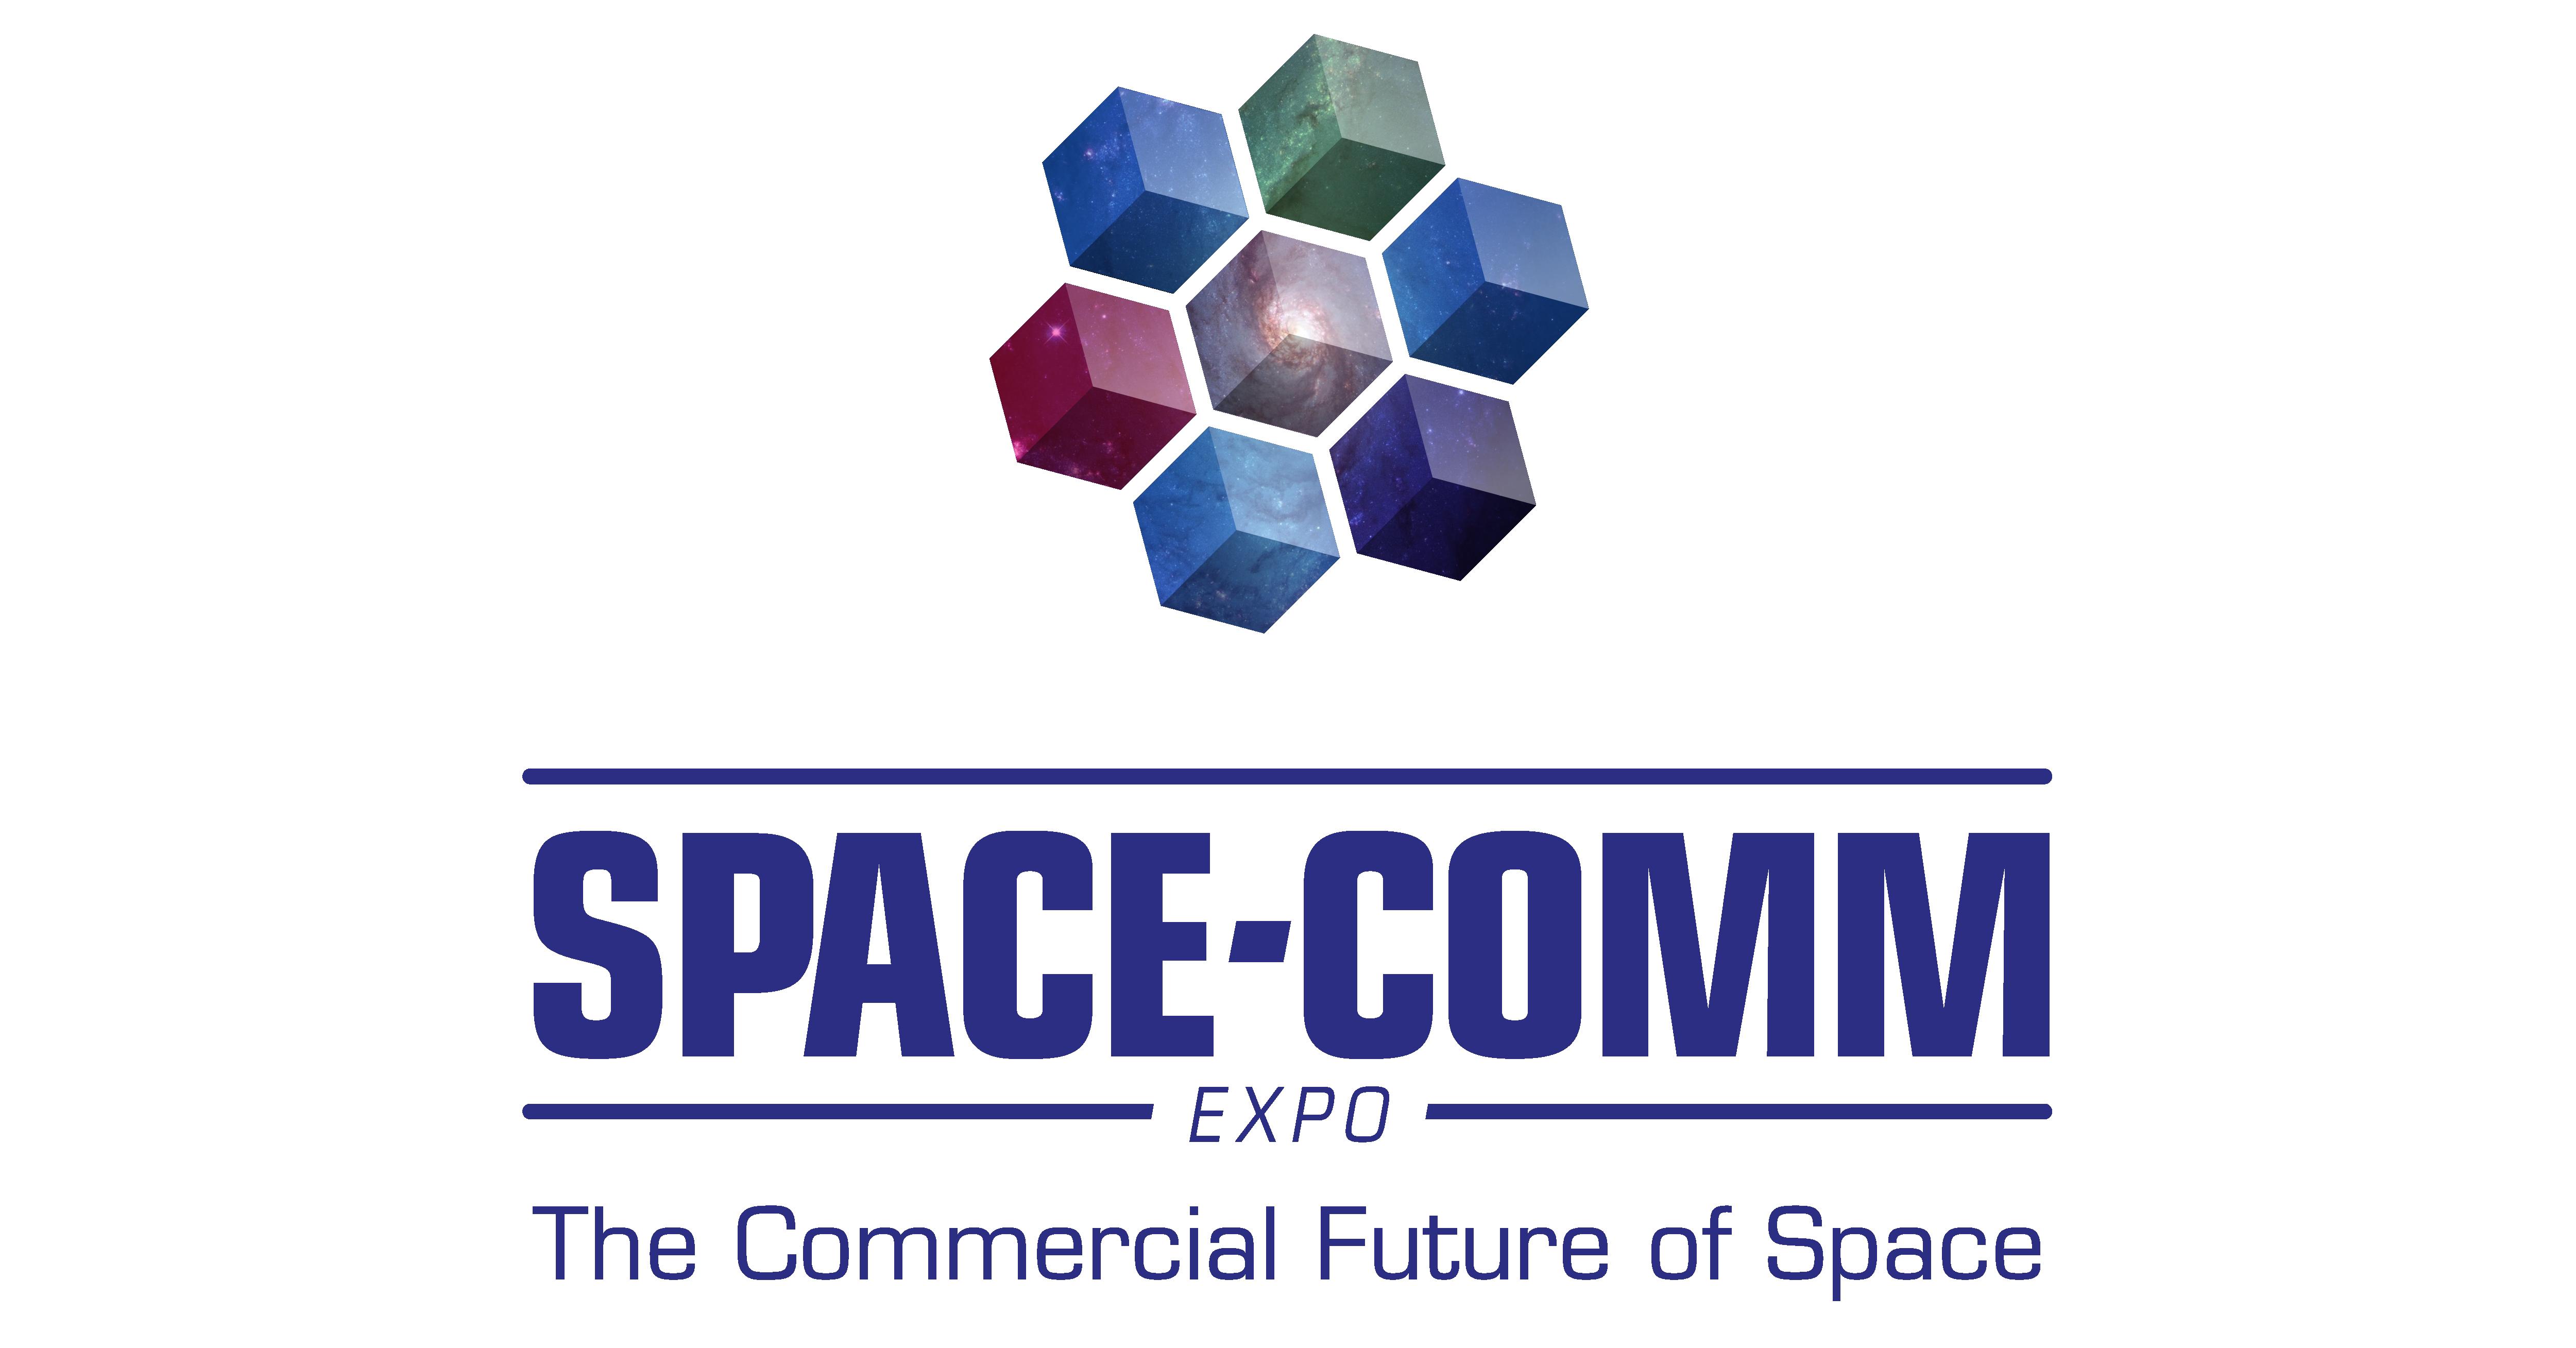 https://f.hubspotusercontent00.net/hubfs/2351800/Logo%20-%20Space-Comm.png